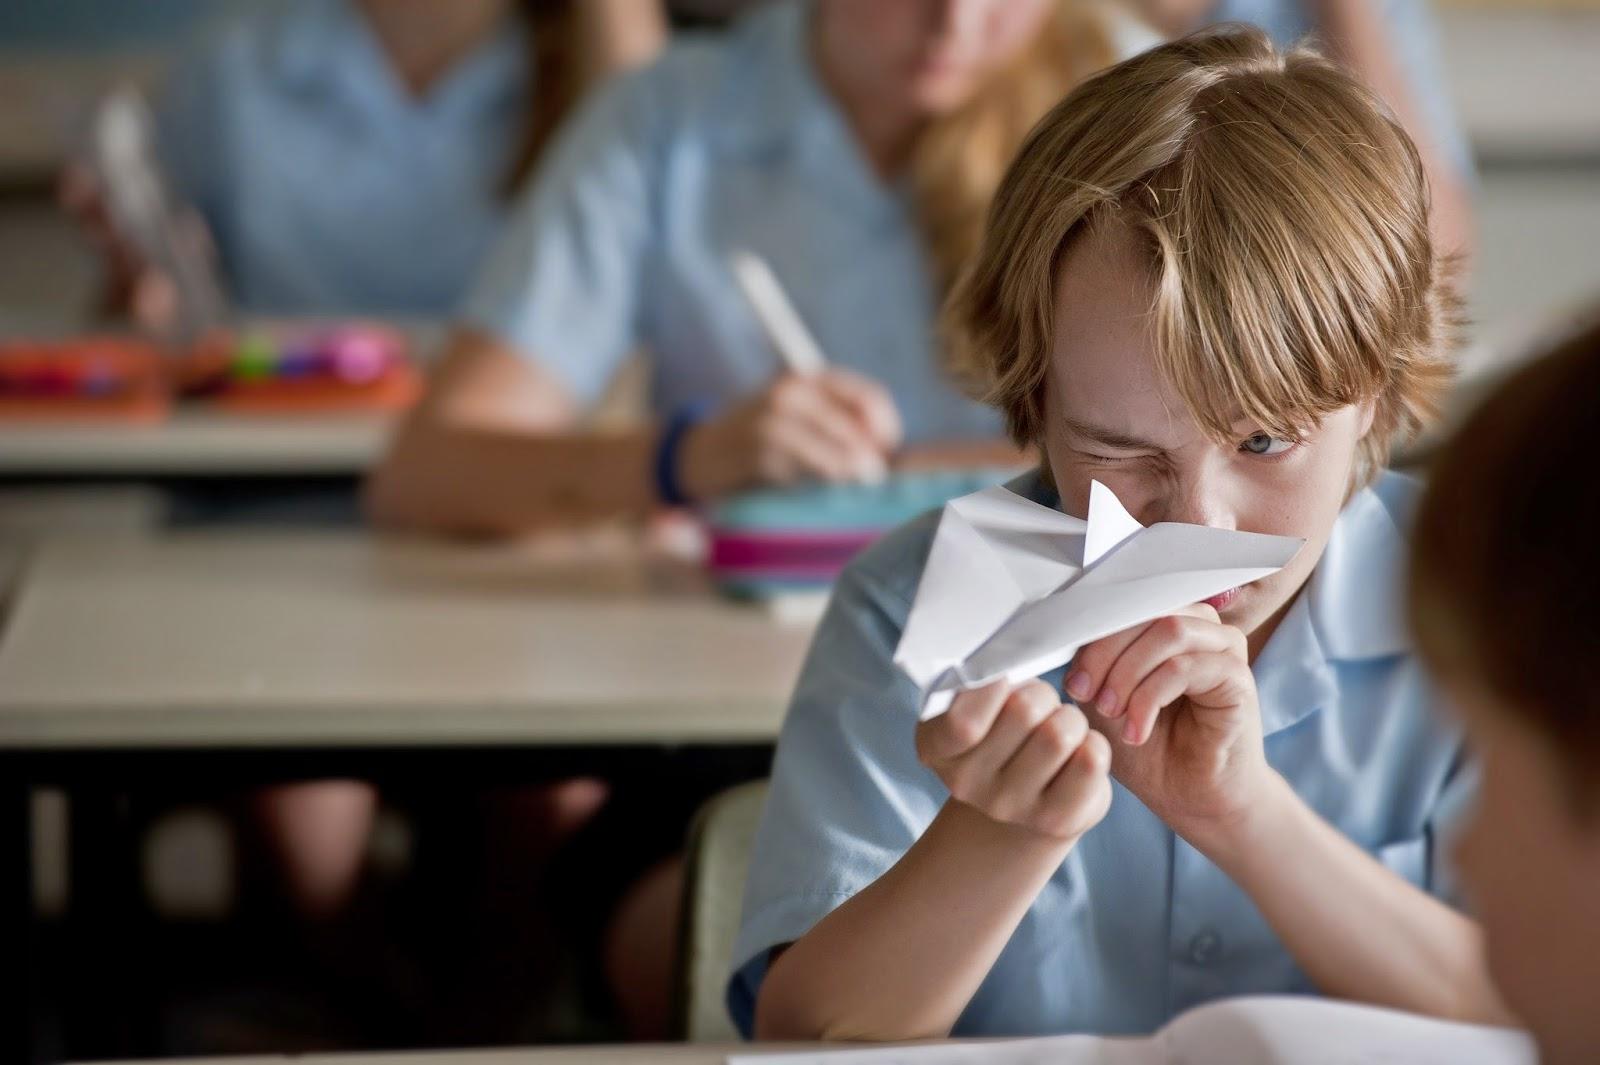 Amazing F15 Paper Airplane Usefulresults Narsil Sword Origamiyard Planes Teaser Trailer